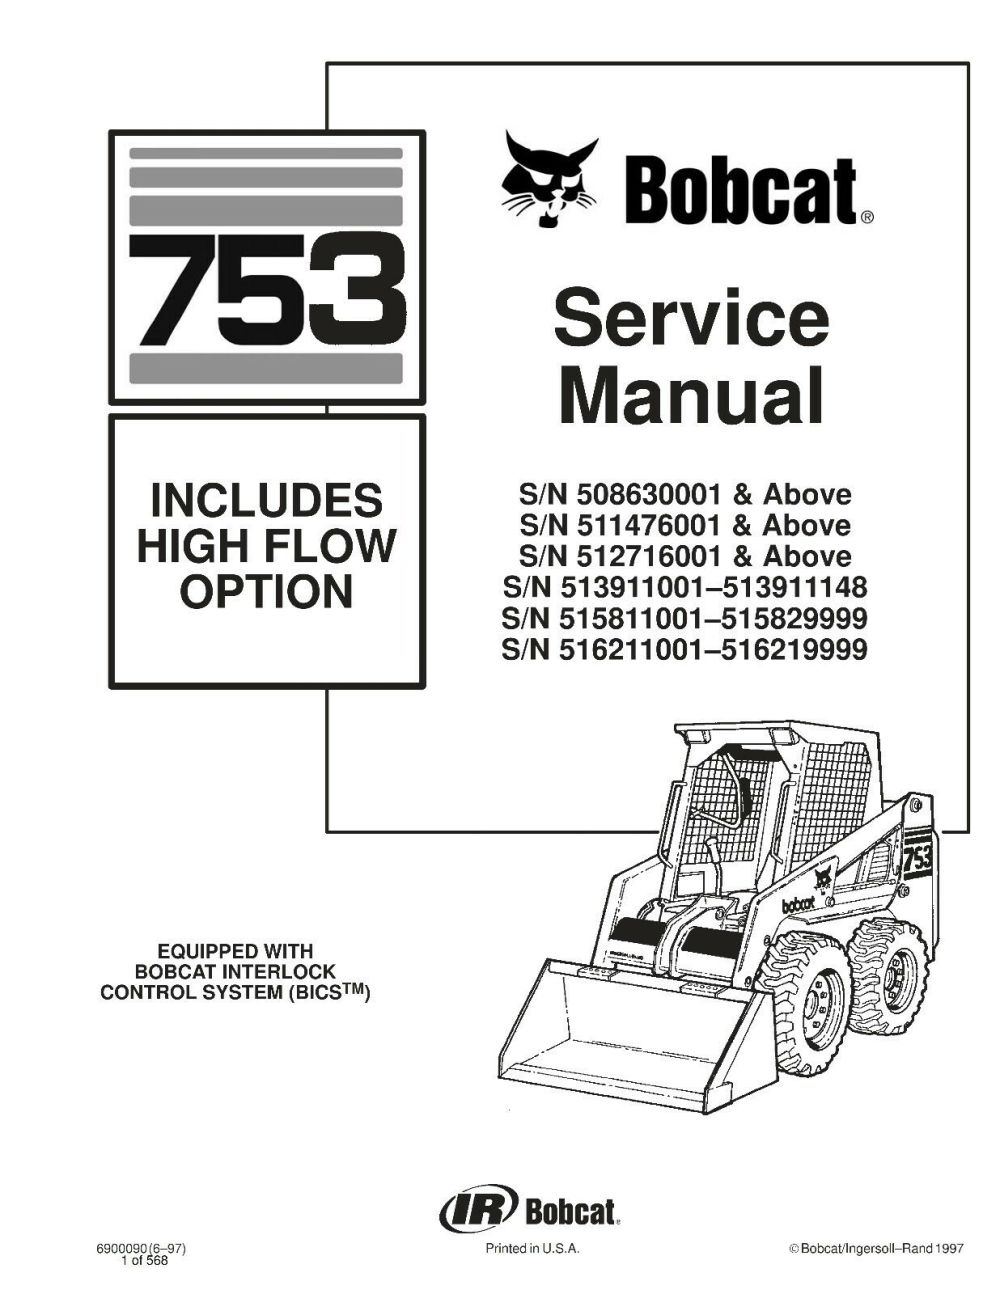 medium resolution of bobcat interlock control system wiring schematic